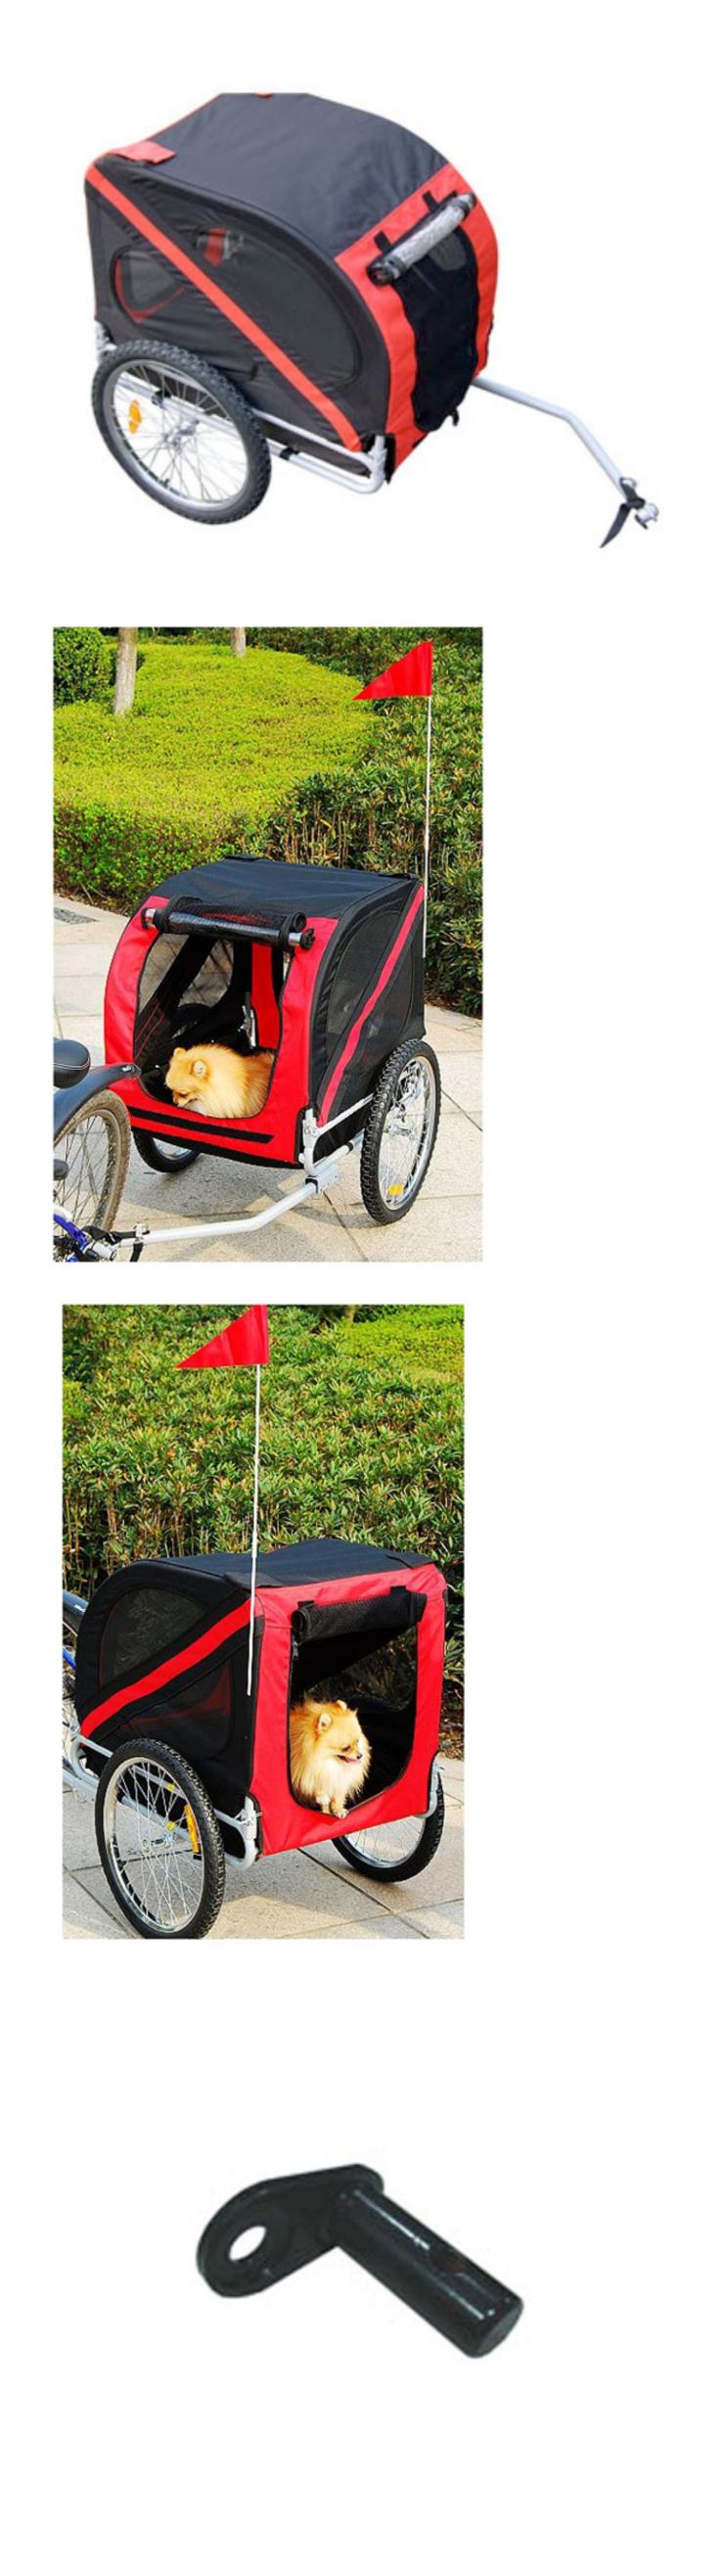 Bike baskets and trailers dog bike carrier trailer pet